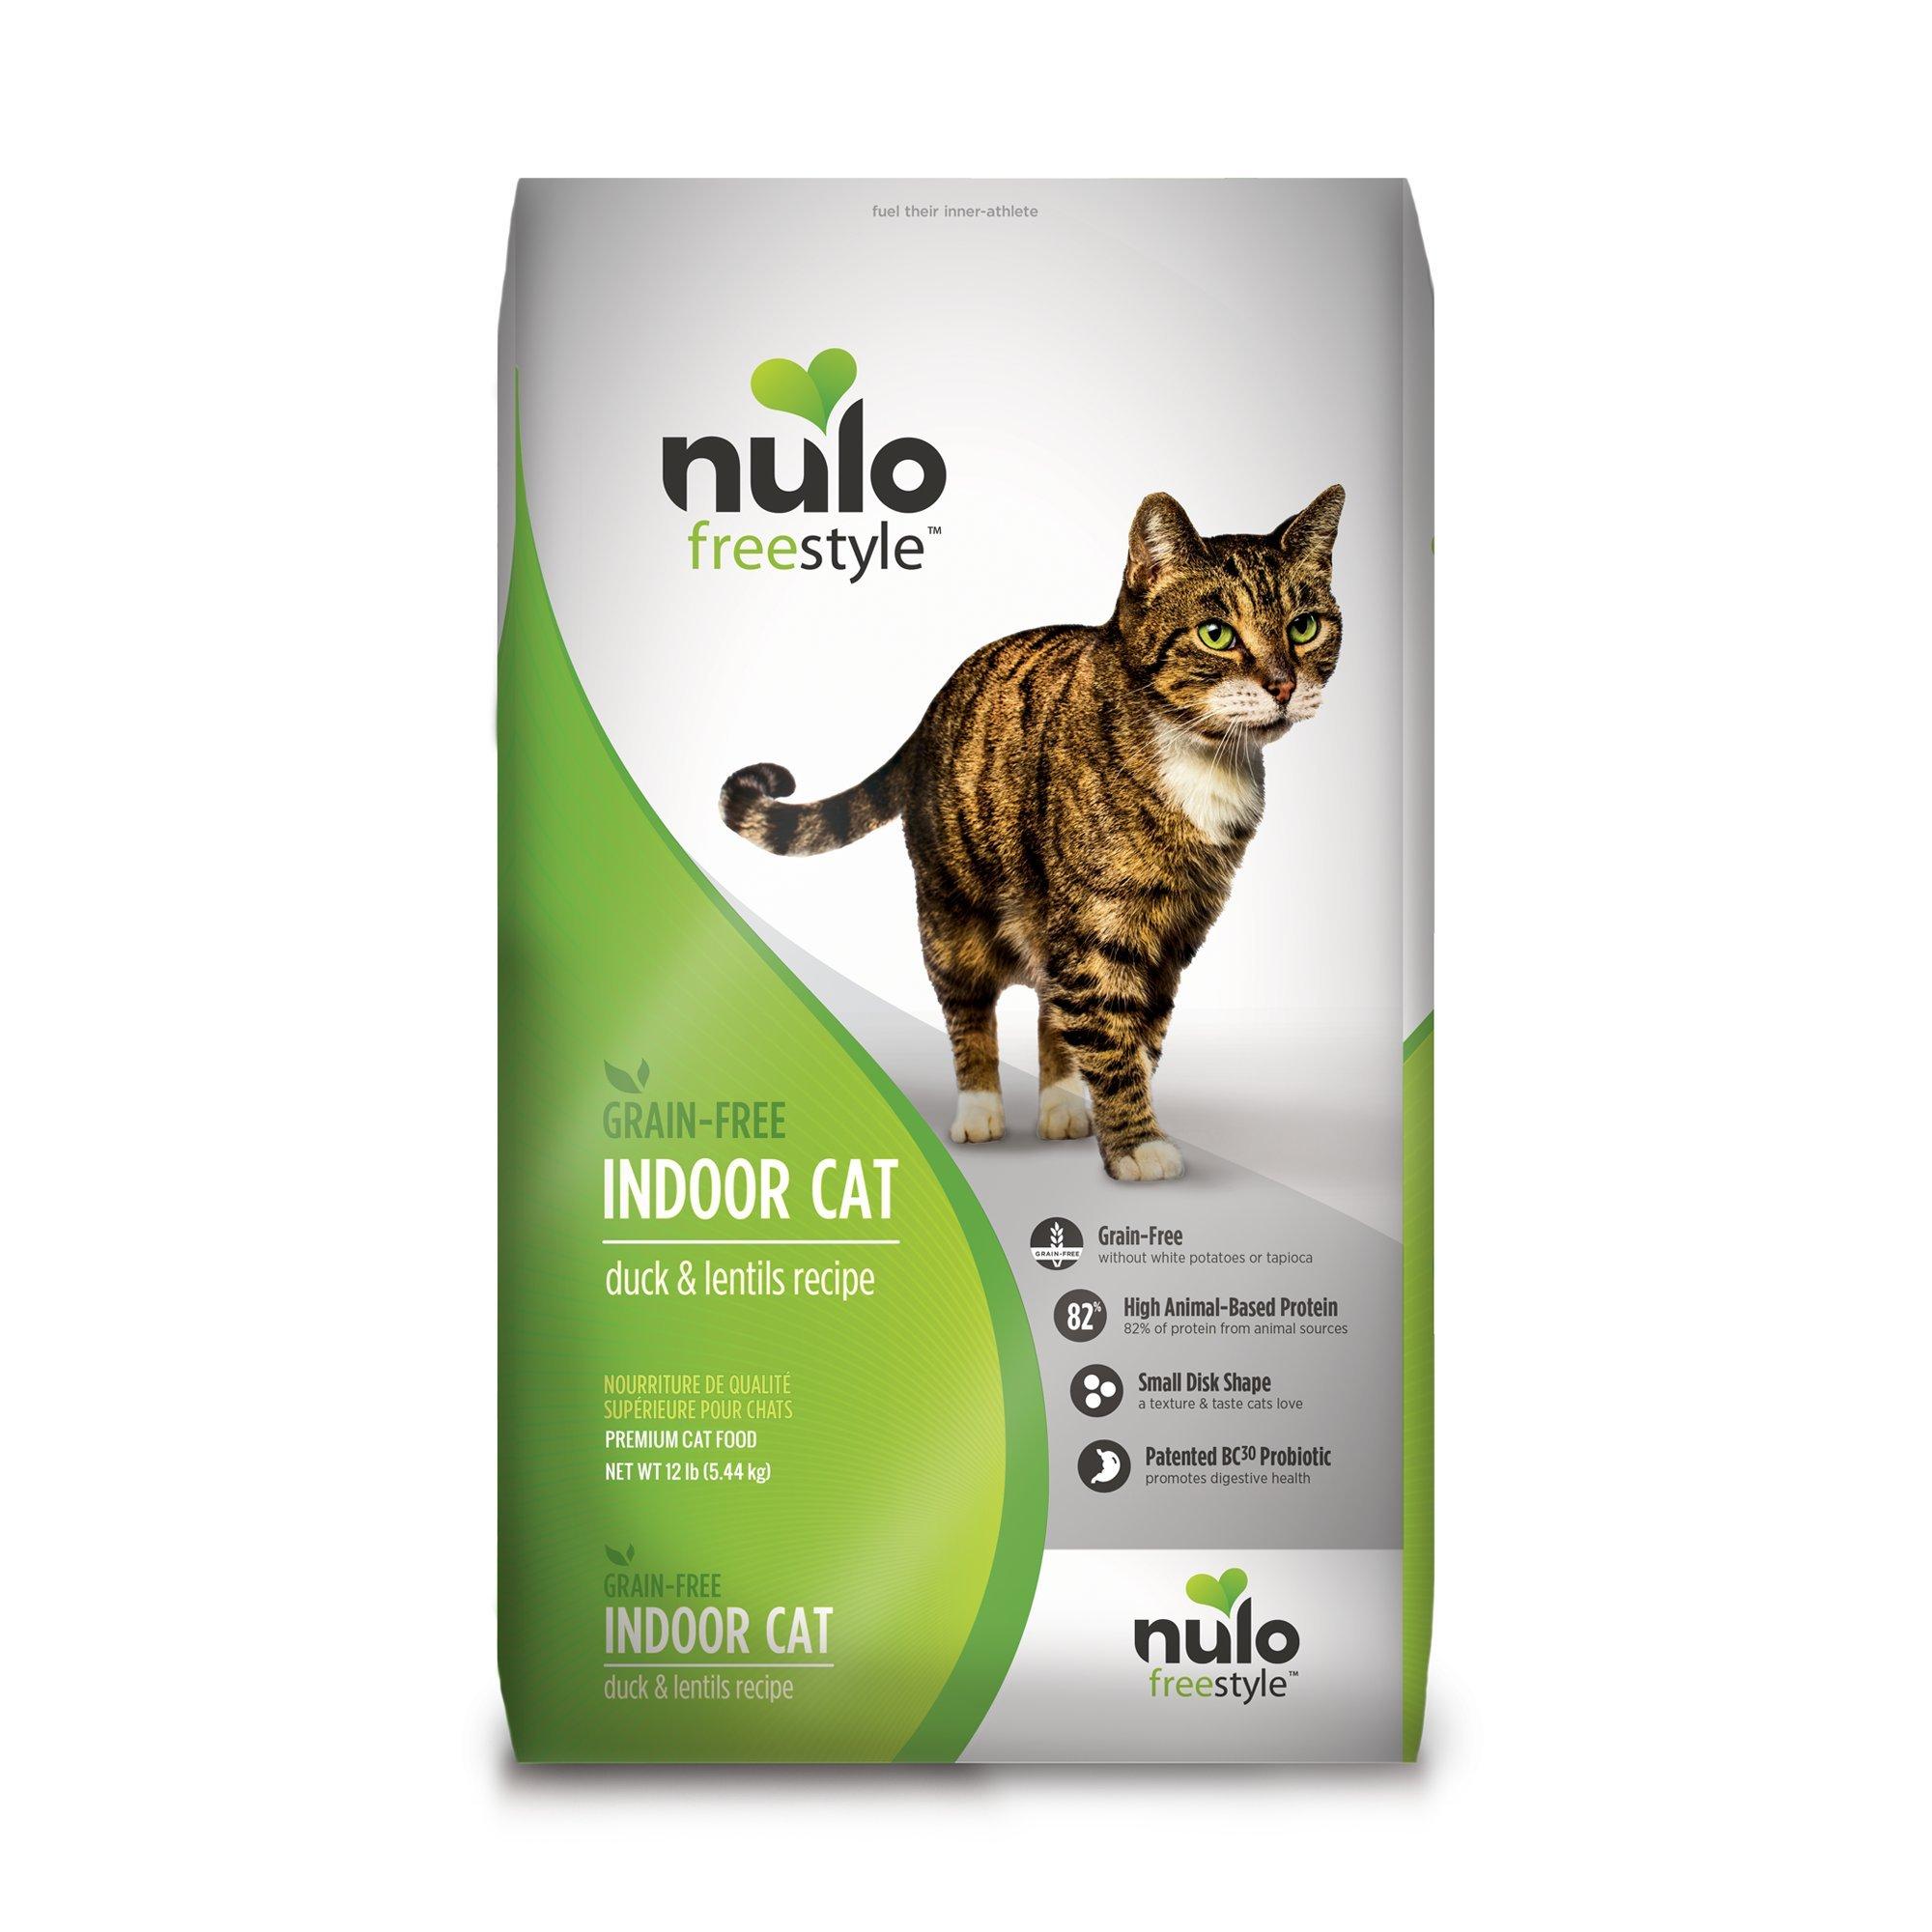 Nulo Grain Free Dry Cat Food BC30 Probiotic (Indoor, 12lb Bag)